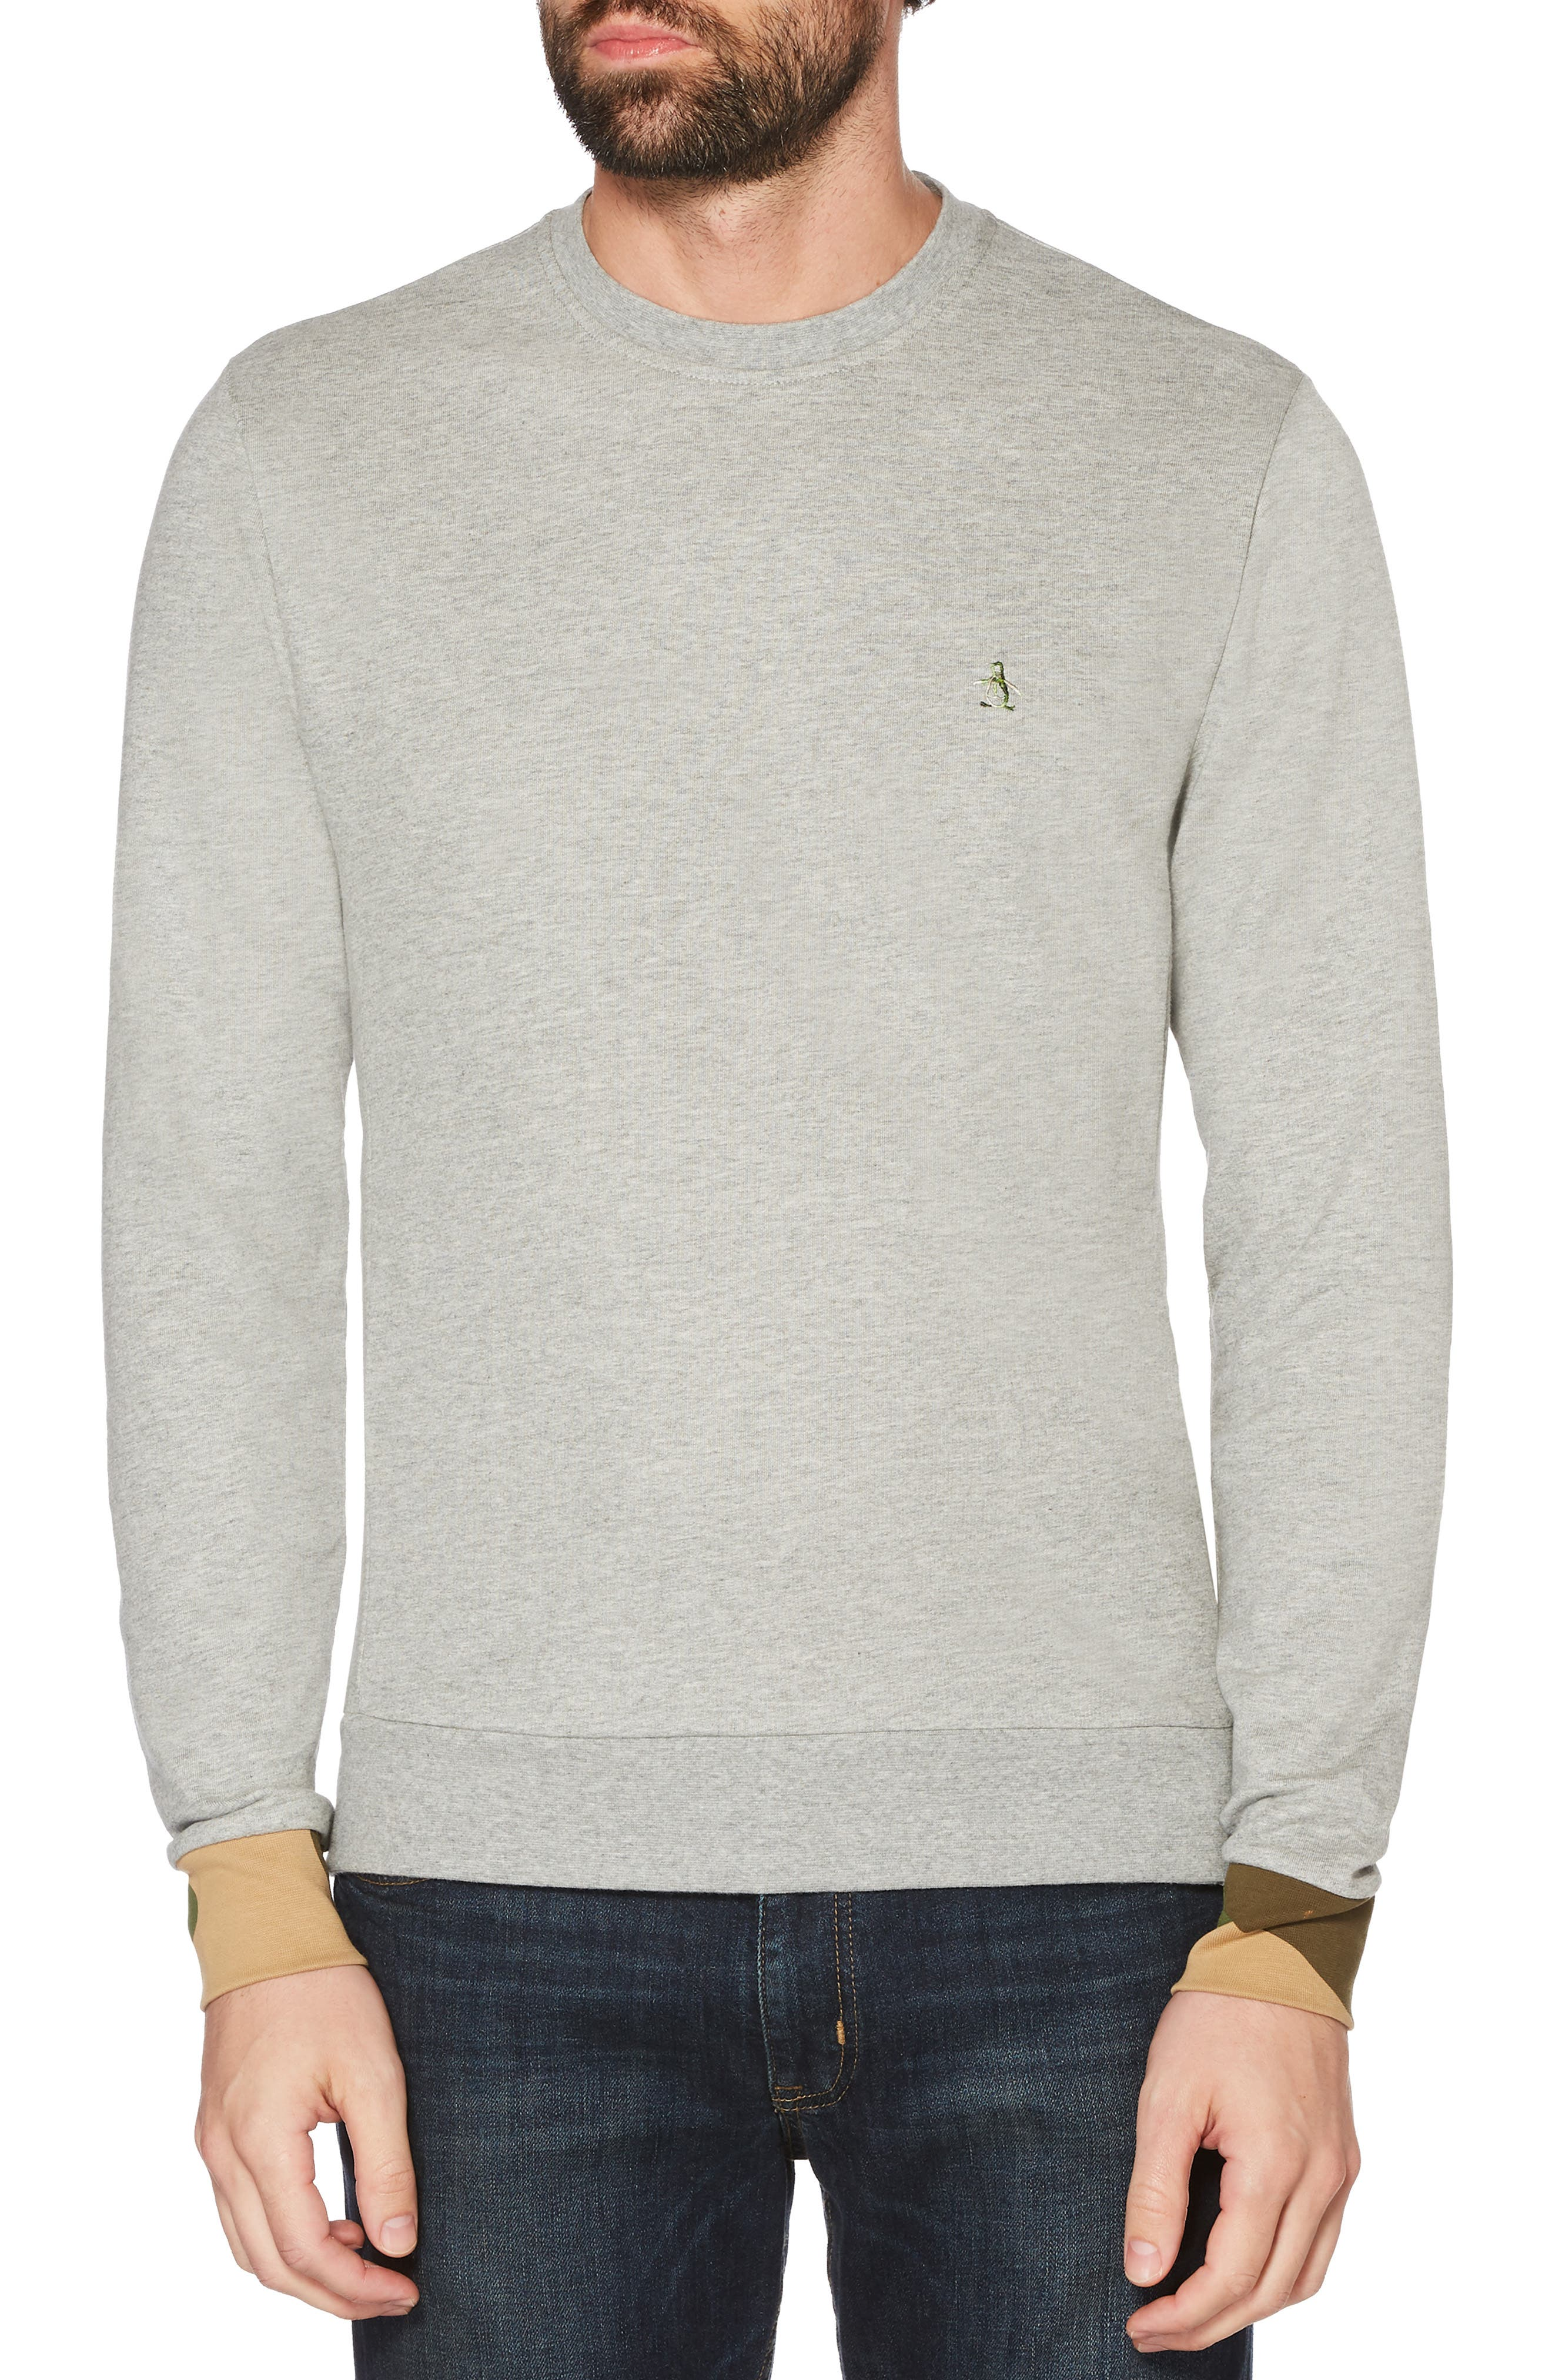 Camo Cuff Sweatshirt,                             Main thumbnail 1, color,                             RAIN HEATHER